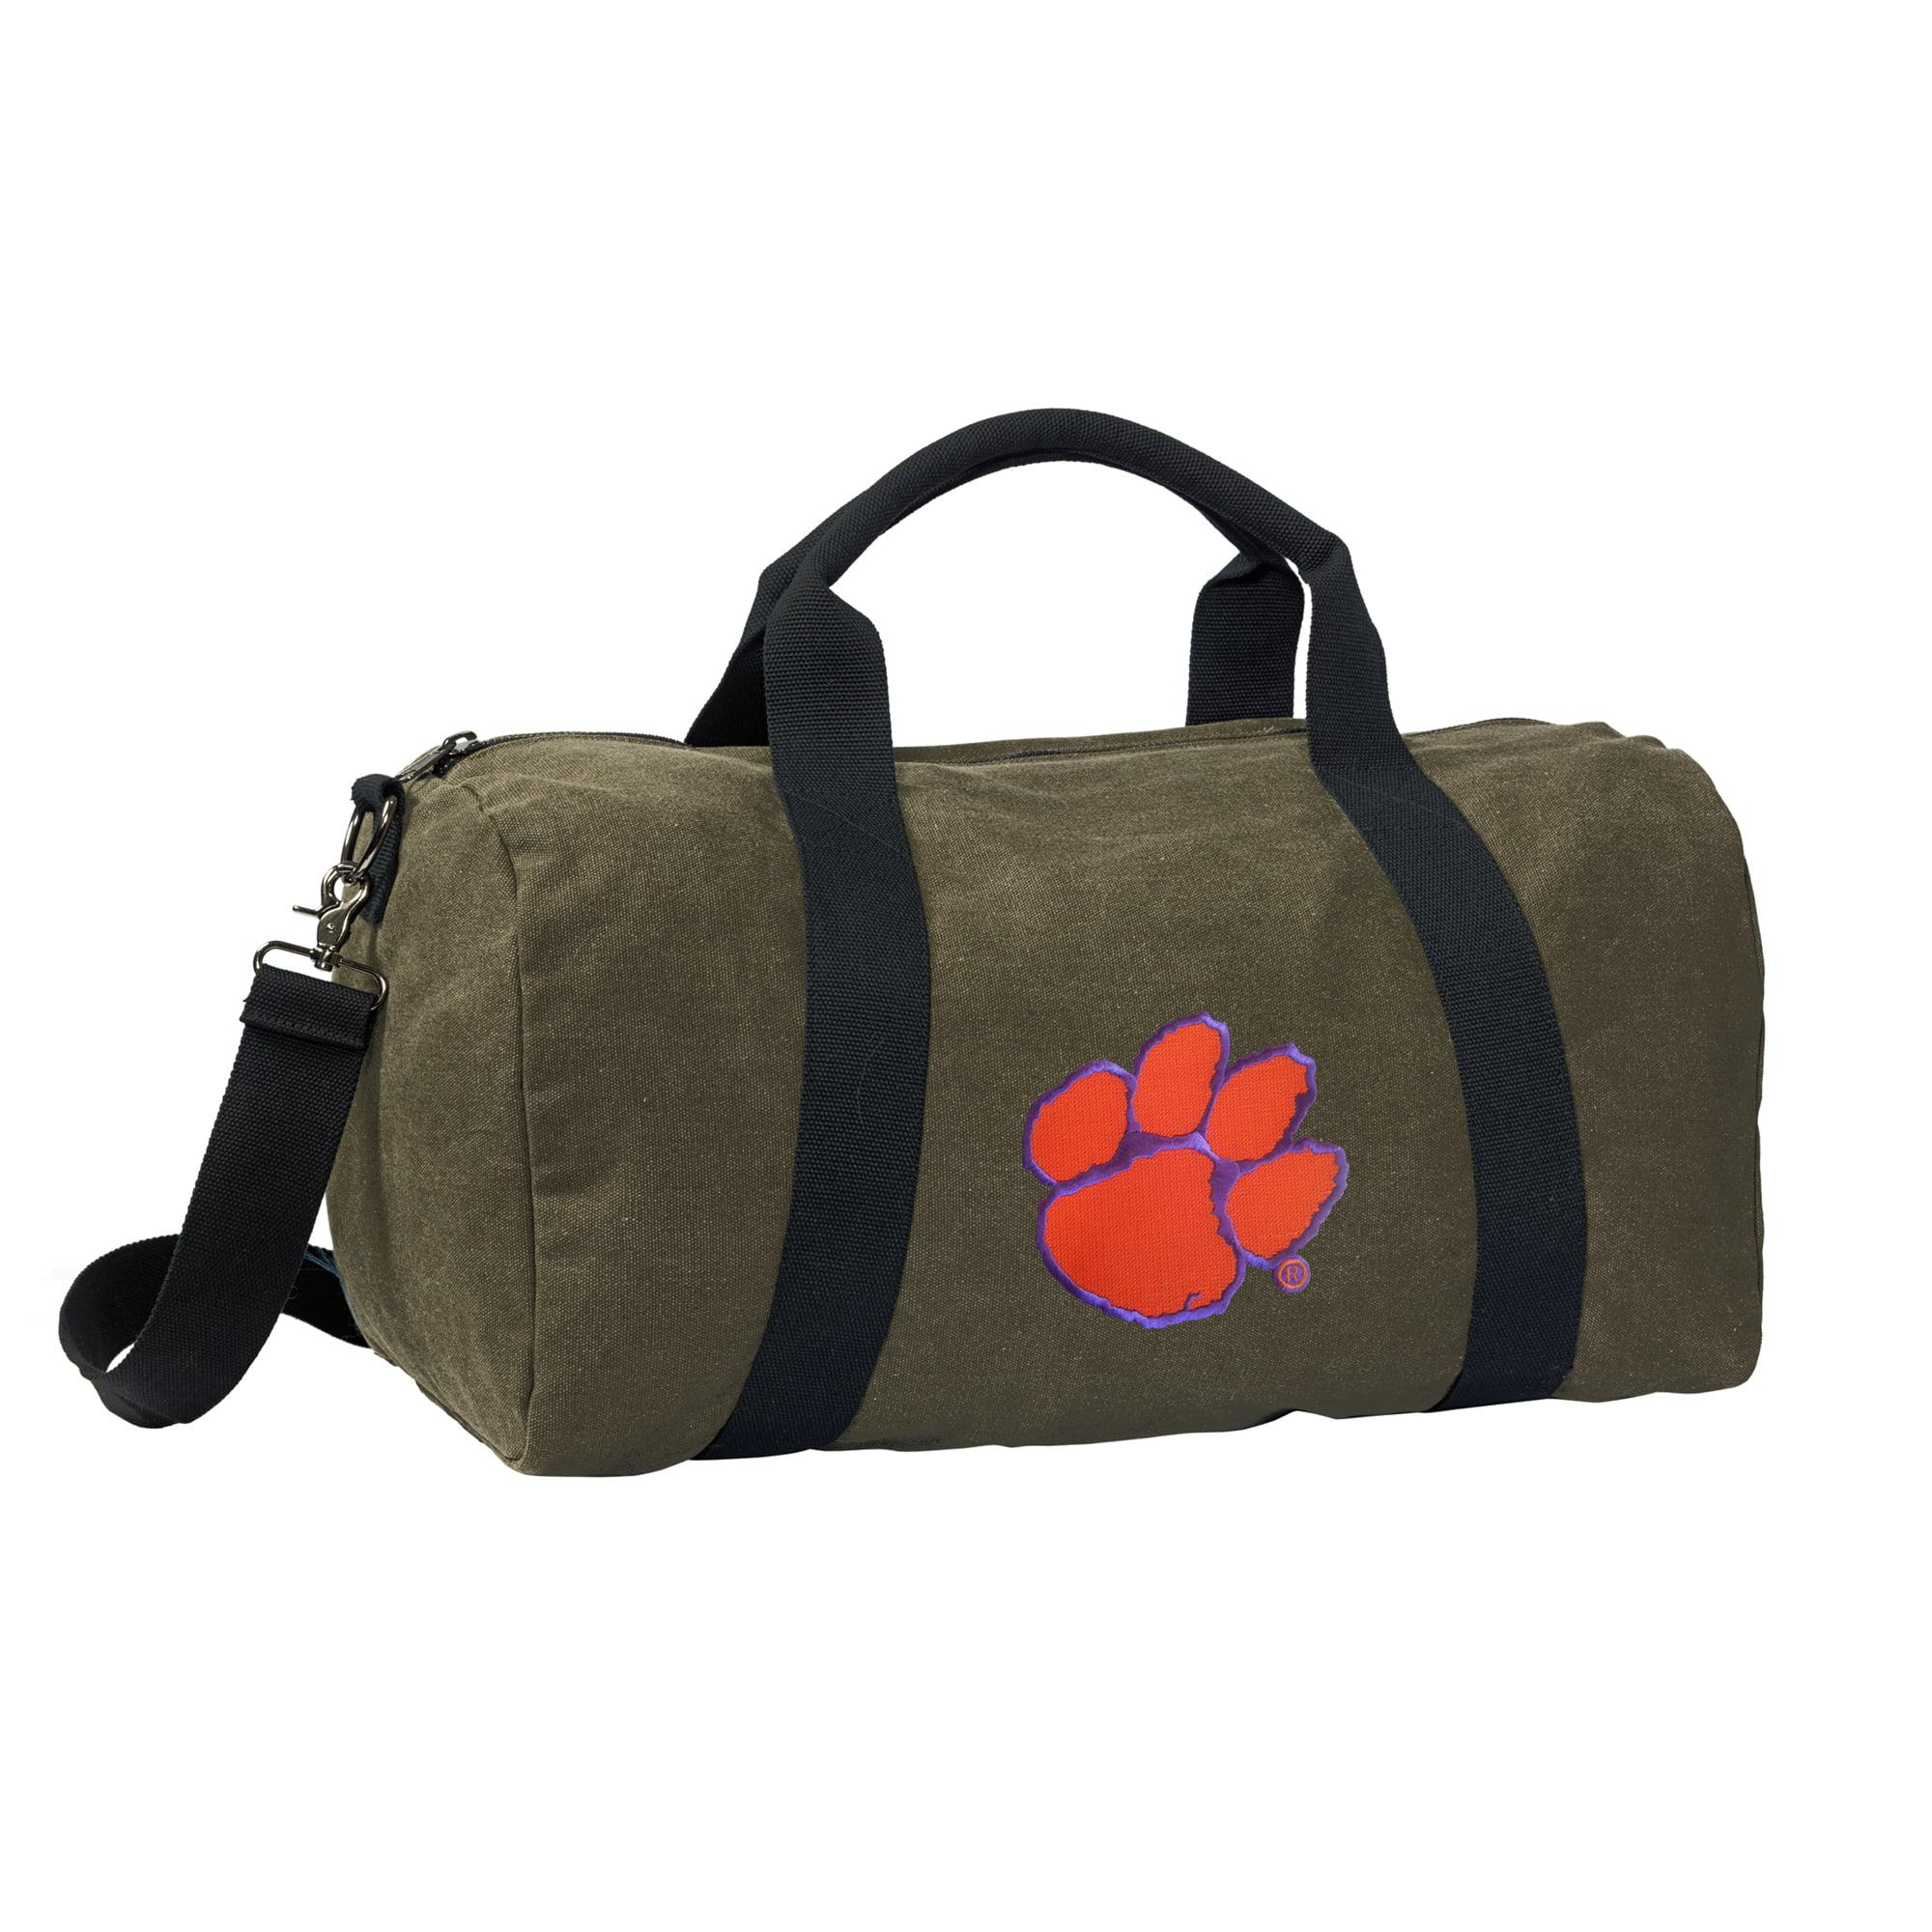 Clemson University Duffle Bag CANVAS Clemson Luggage Bag by